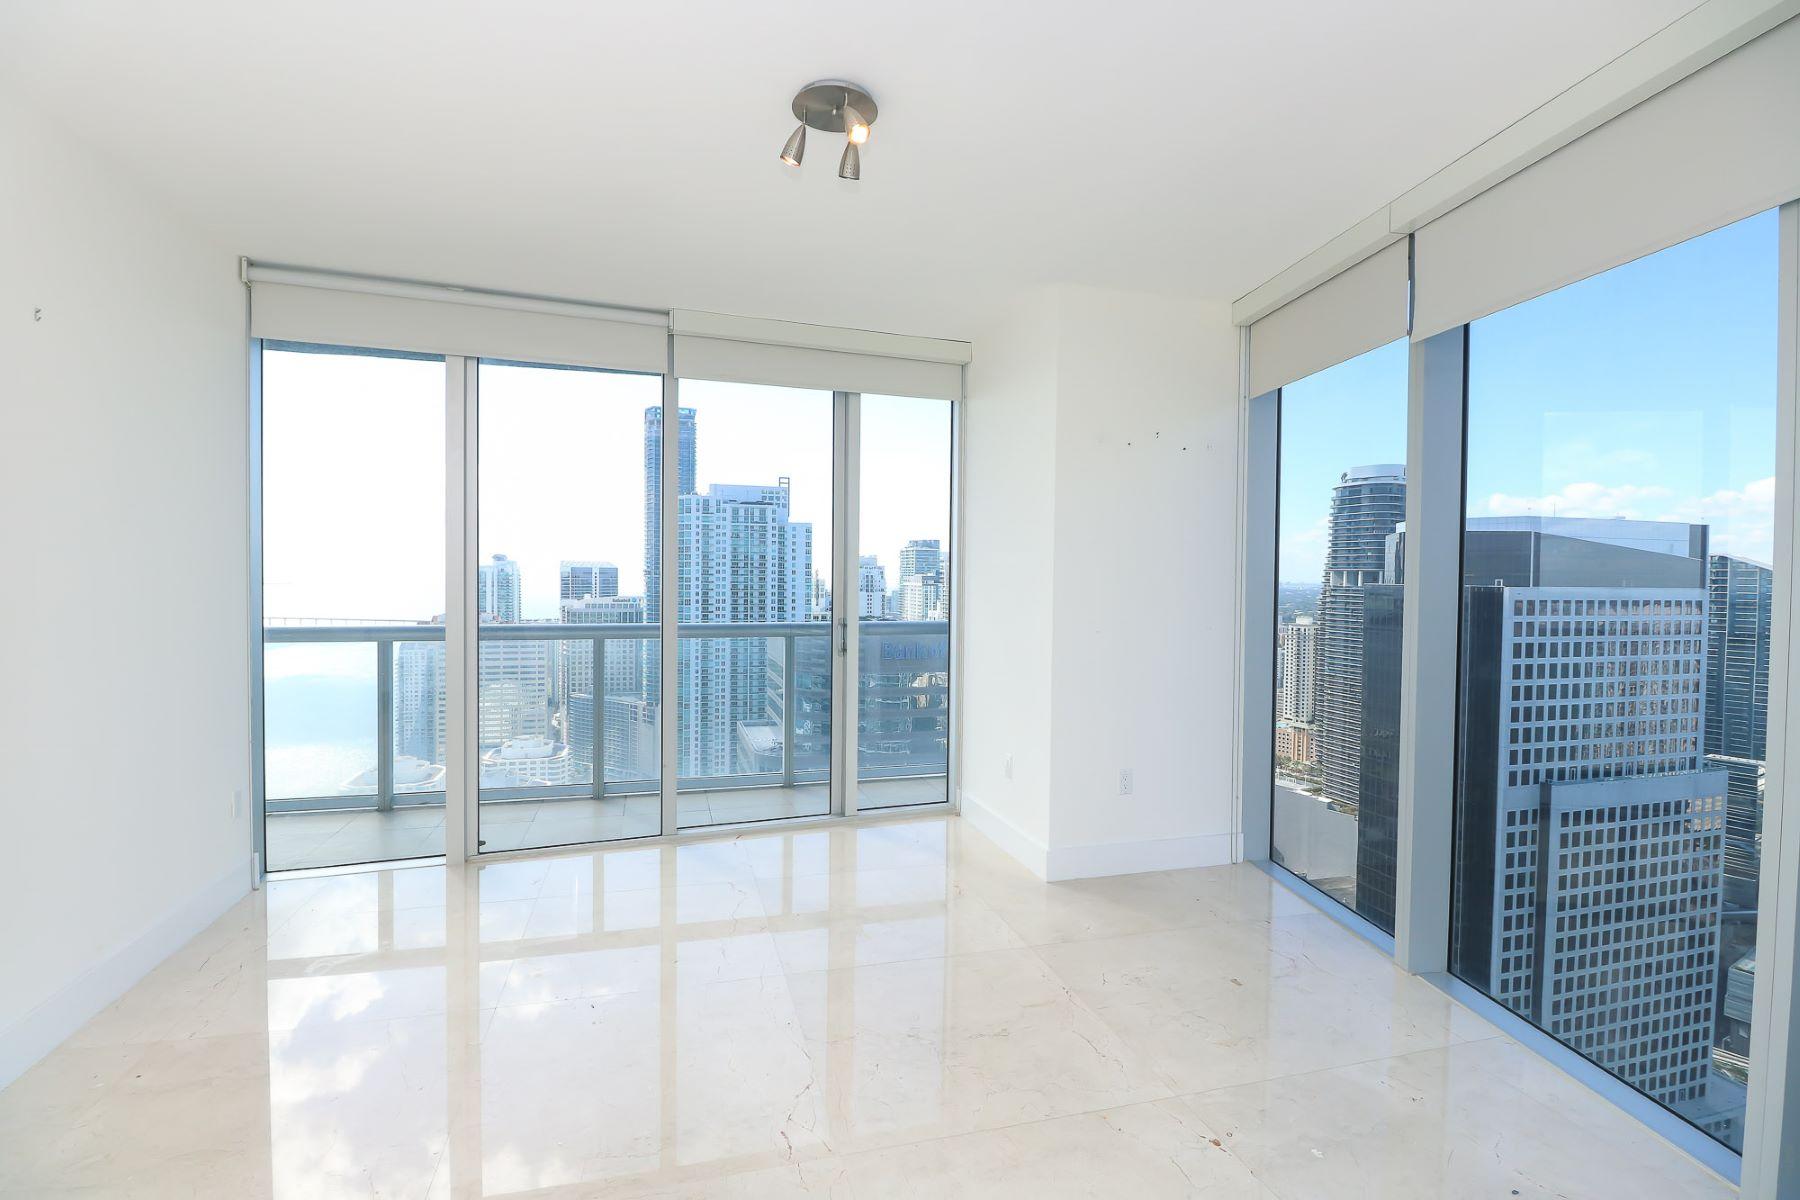 Condominium for Rent at 495 Brickell Ave #4711 495 Brickell Ave 4711 Miami, Florida 33131 United States